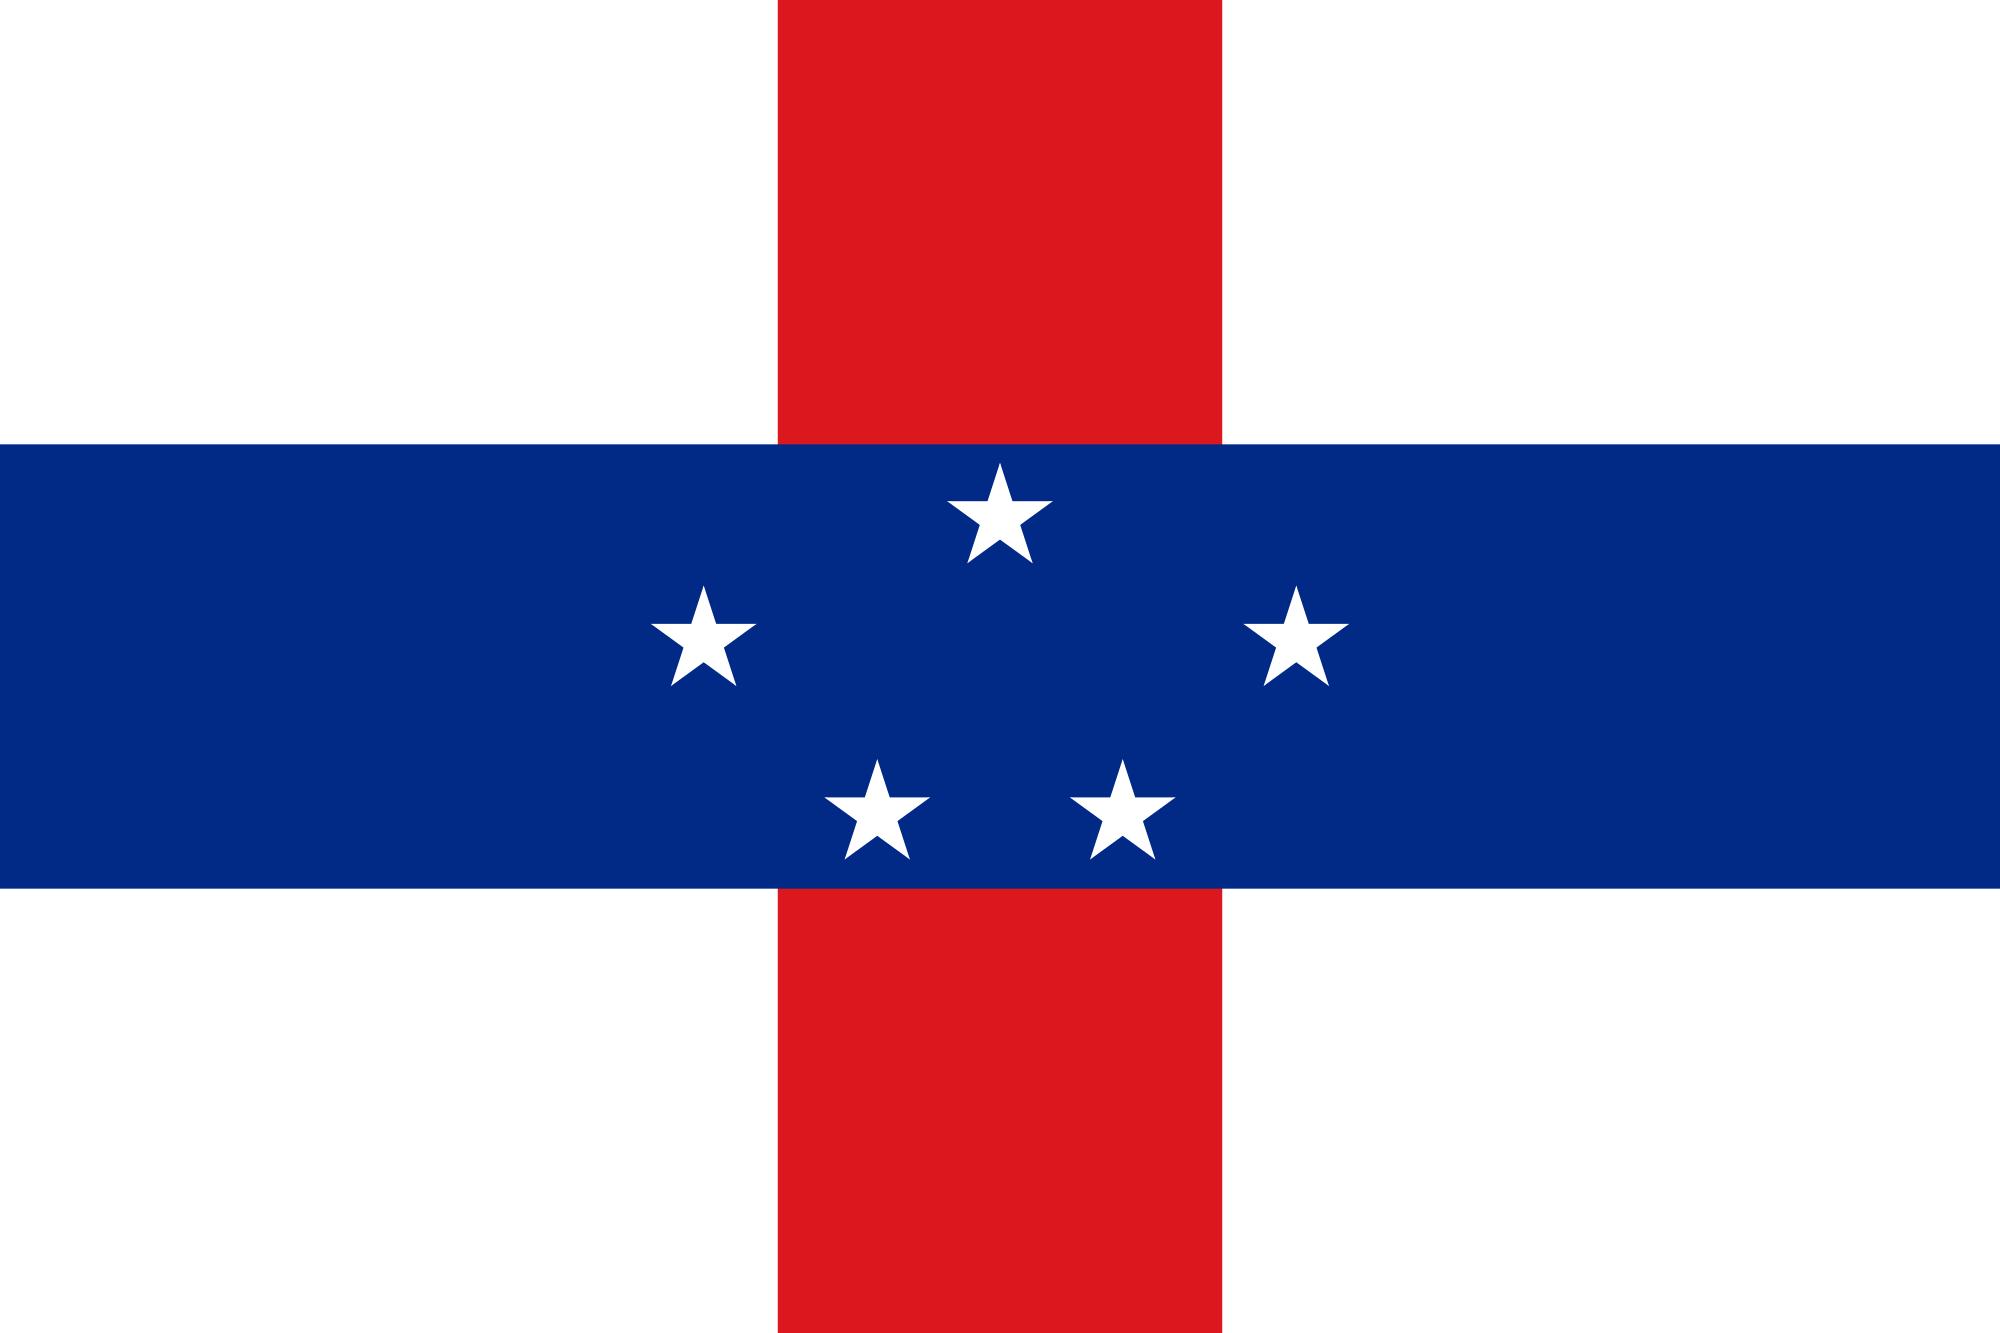 antillas holandesas, paese, emblema, logo, simbolo - Sfondi HD - Professor-falken.com